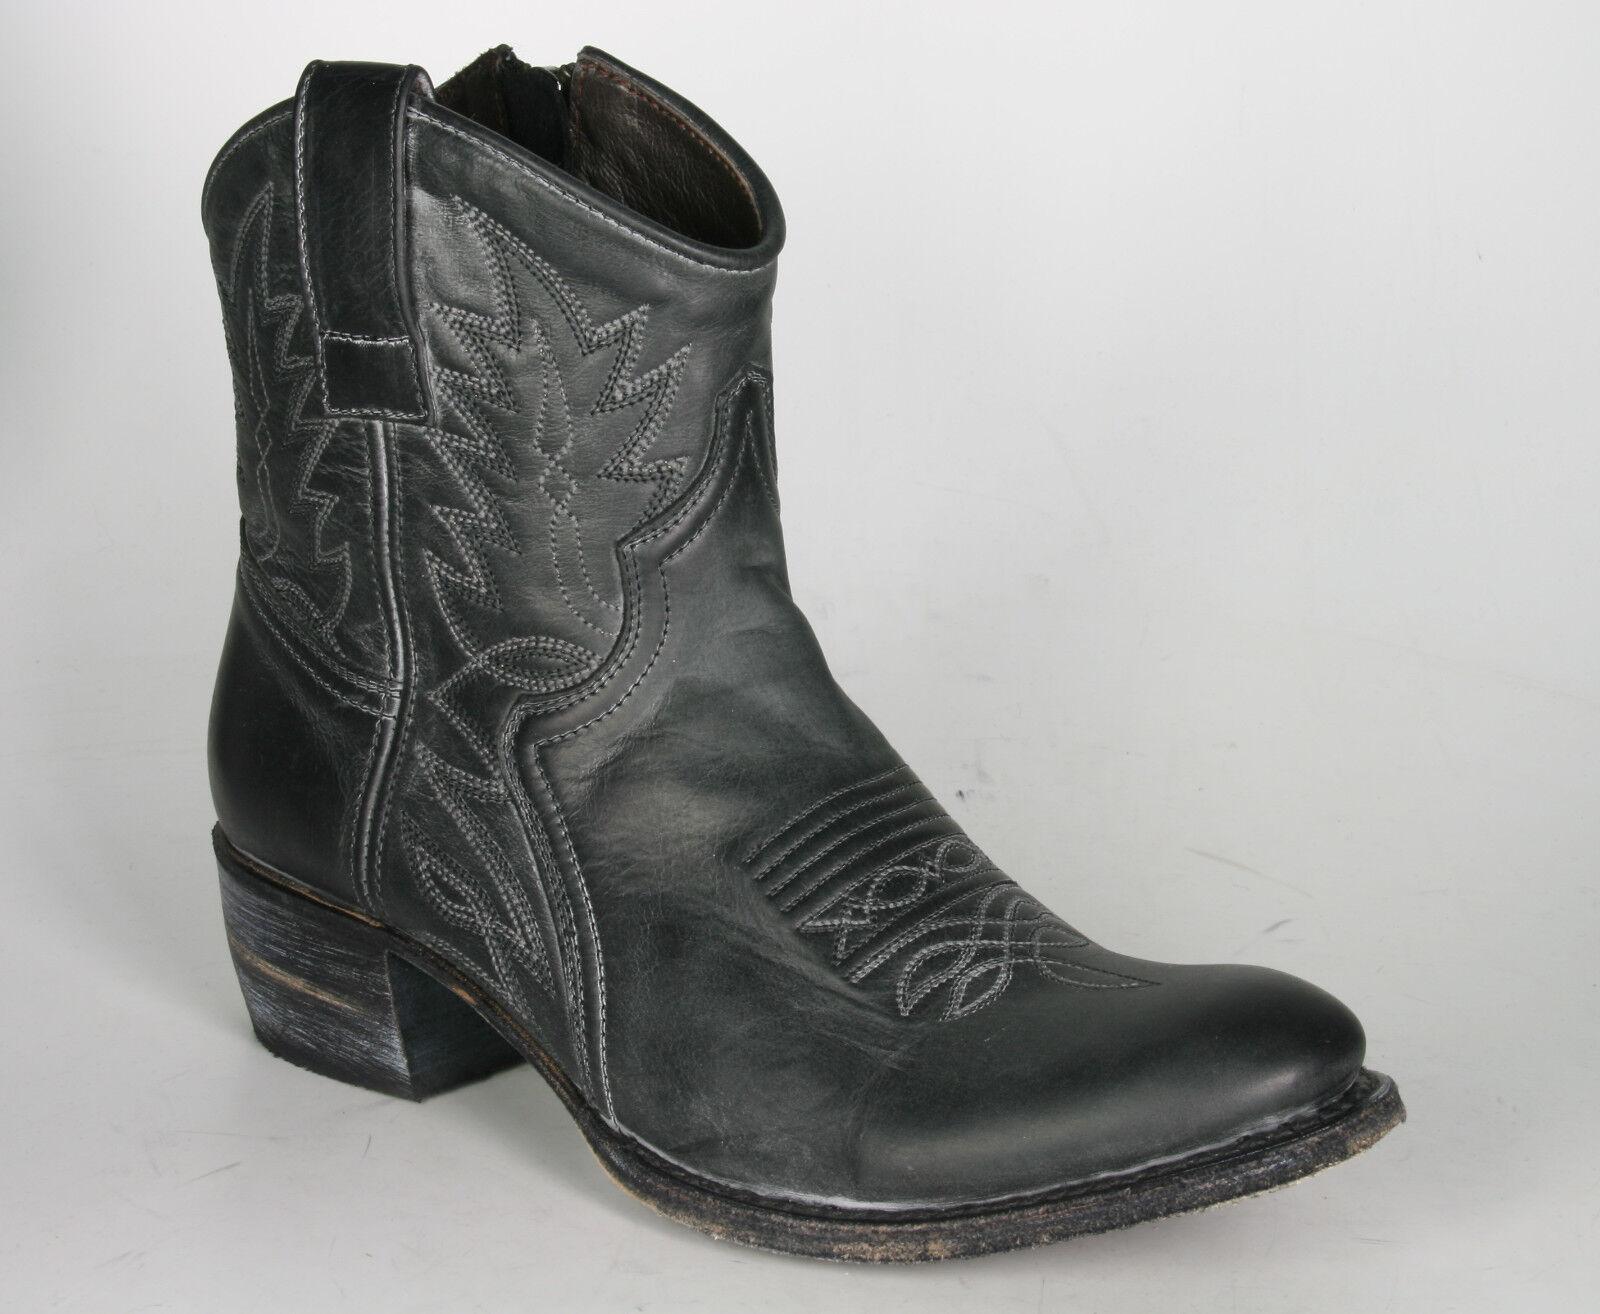 Grandes zapatos con descuento 10163 Sendra Ankelboots Antracita Rahmengenähte Stiefeletten Bohostyle